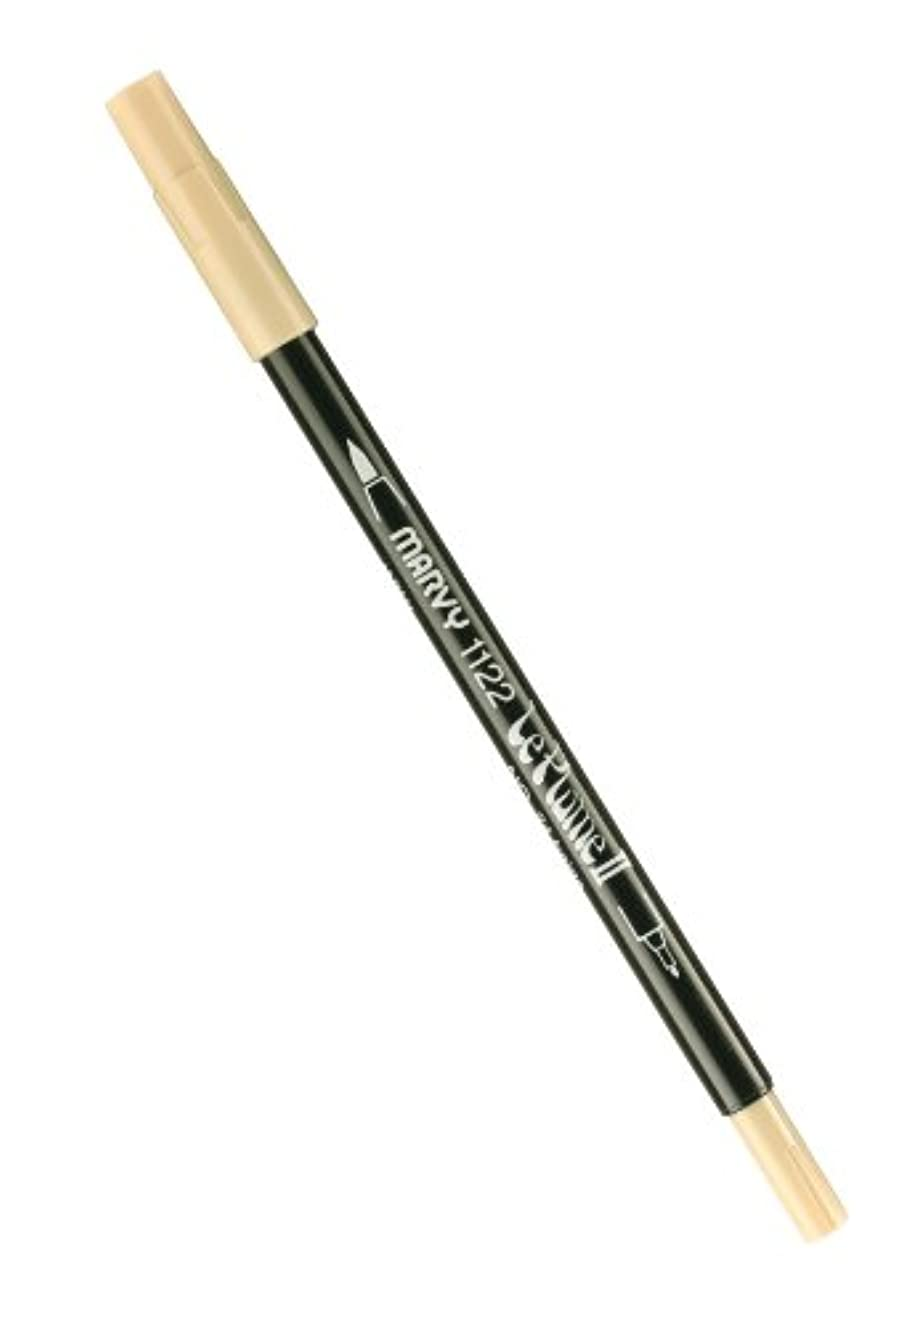 Uchida 1122-C-24 Marvy Extra Fine Tip Le Plume II Double Ender Marker Pen, Beige